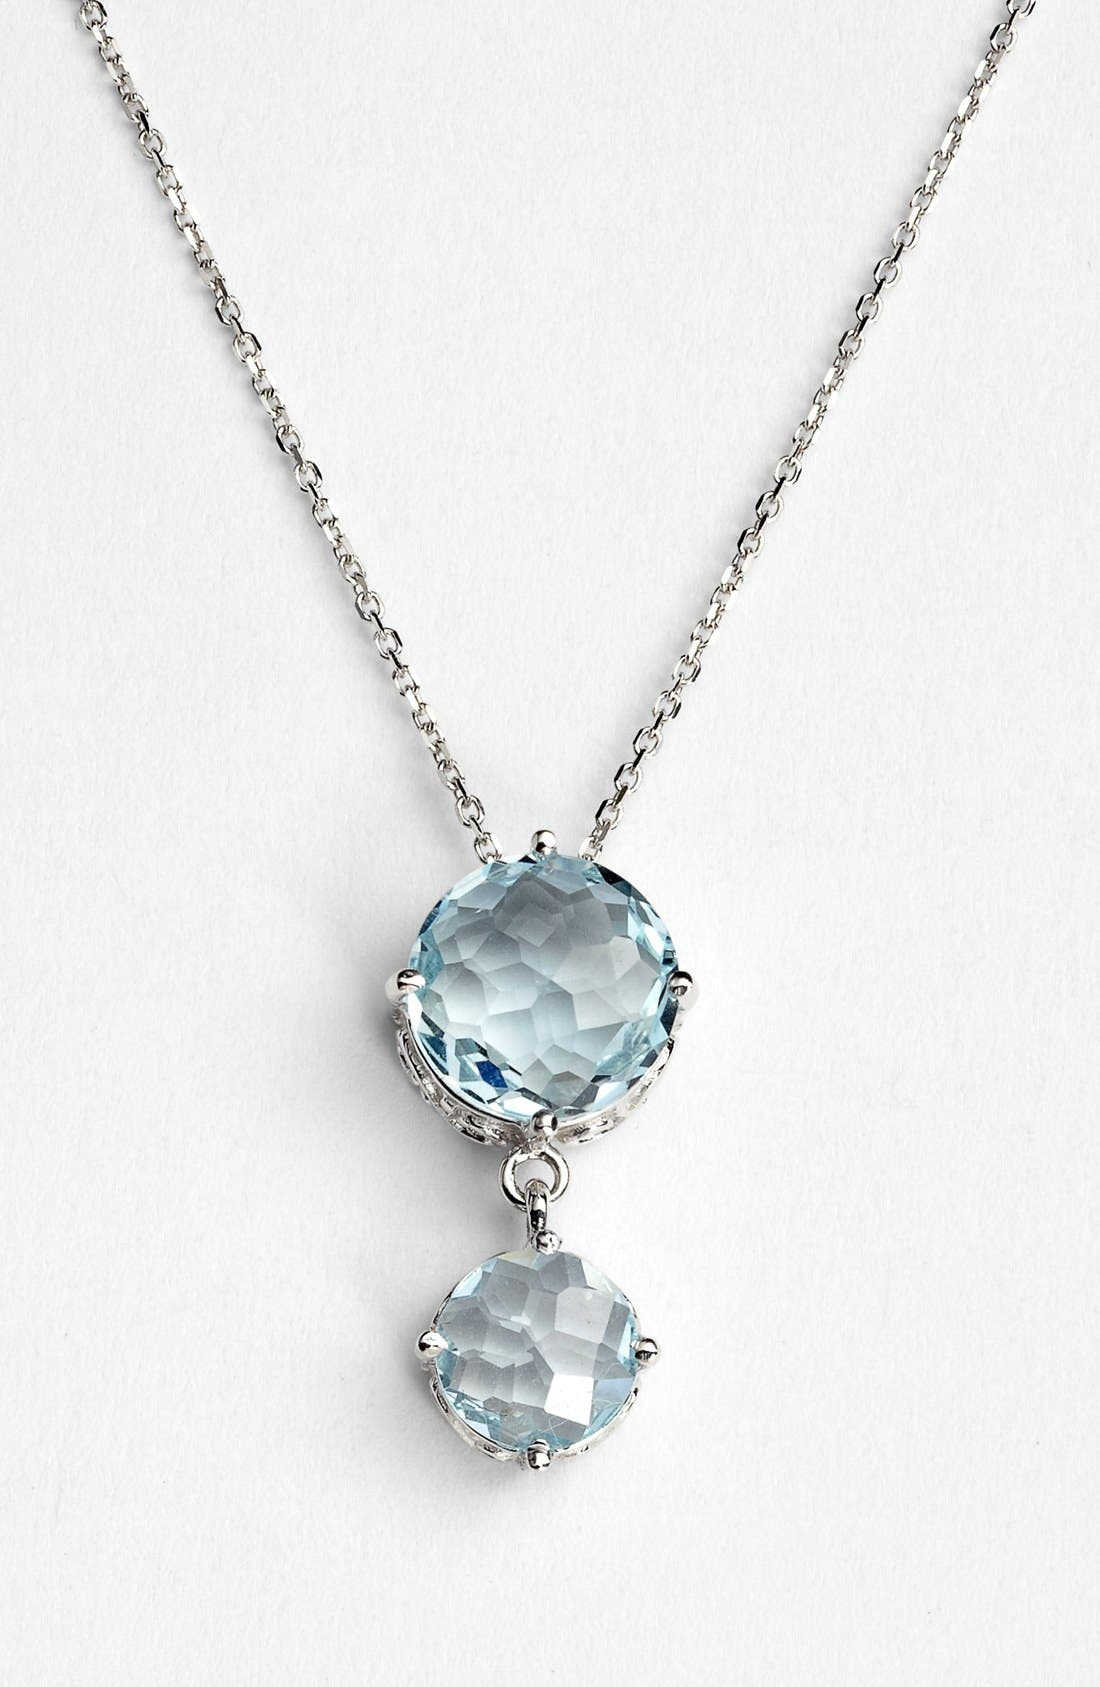 Main Image - KALAN by Suzanne Kalan Double Pendant Necklace